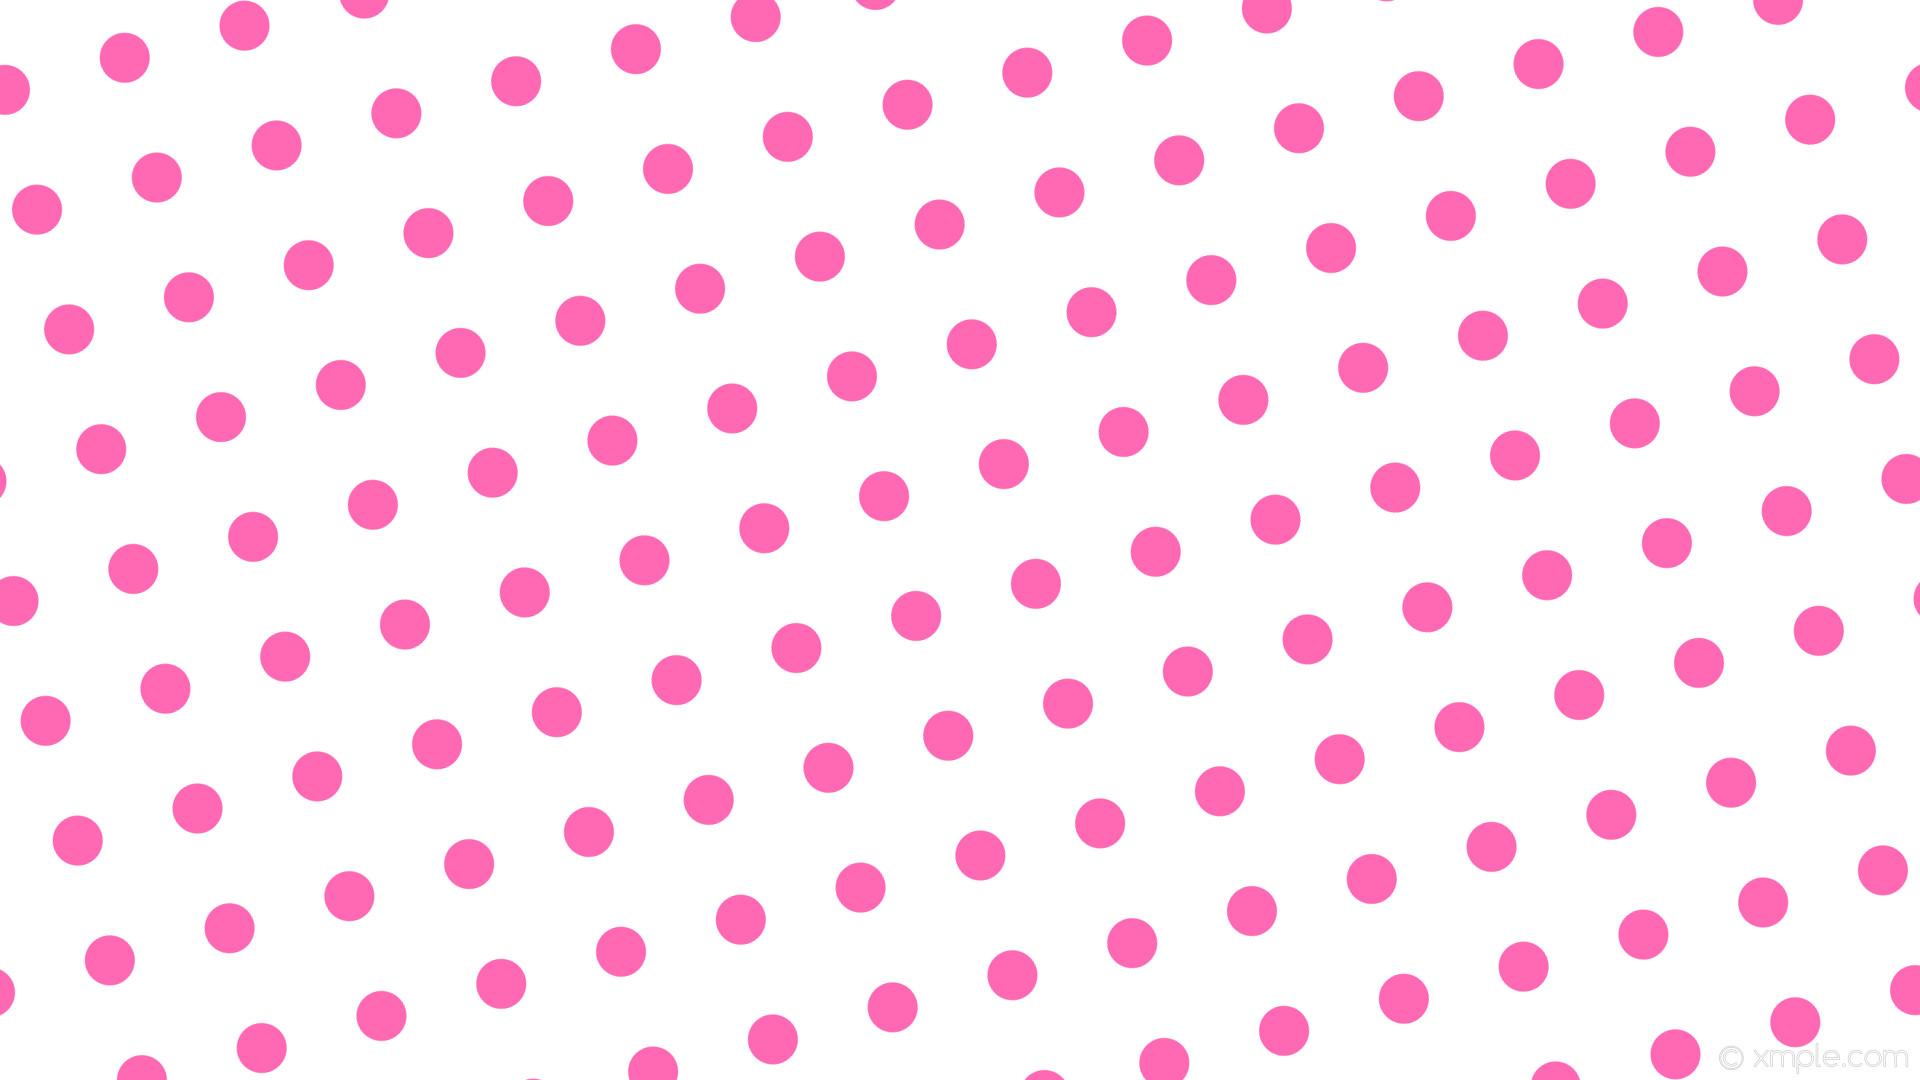 wallpaper white pink dots spots polka hot pink #ffffff #ff69b4 195° 50px  124px